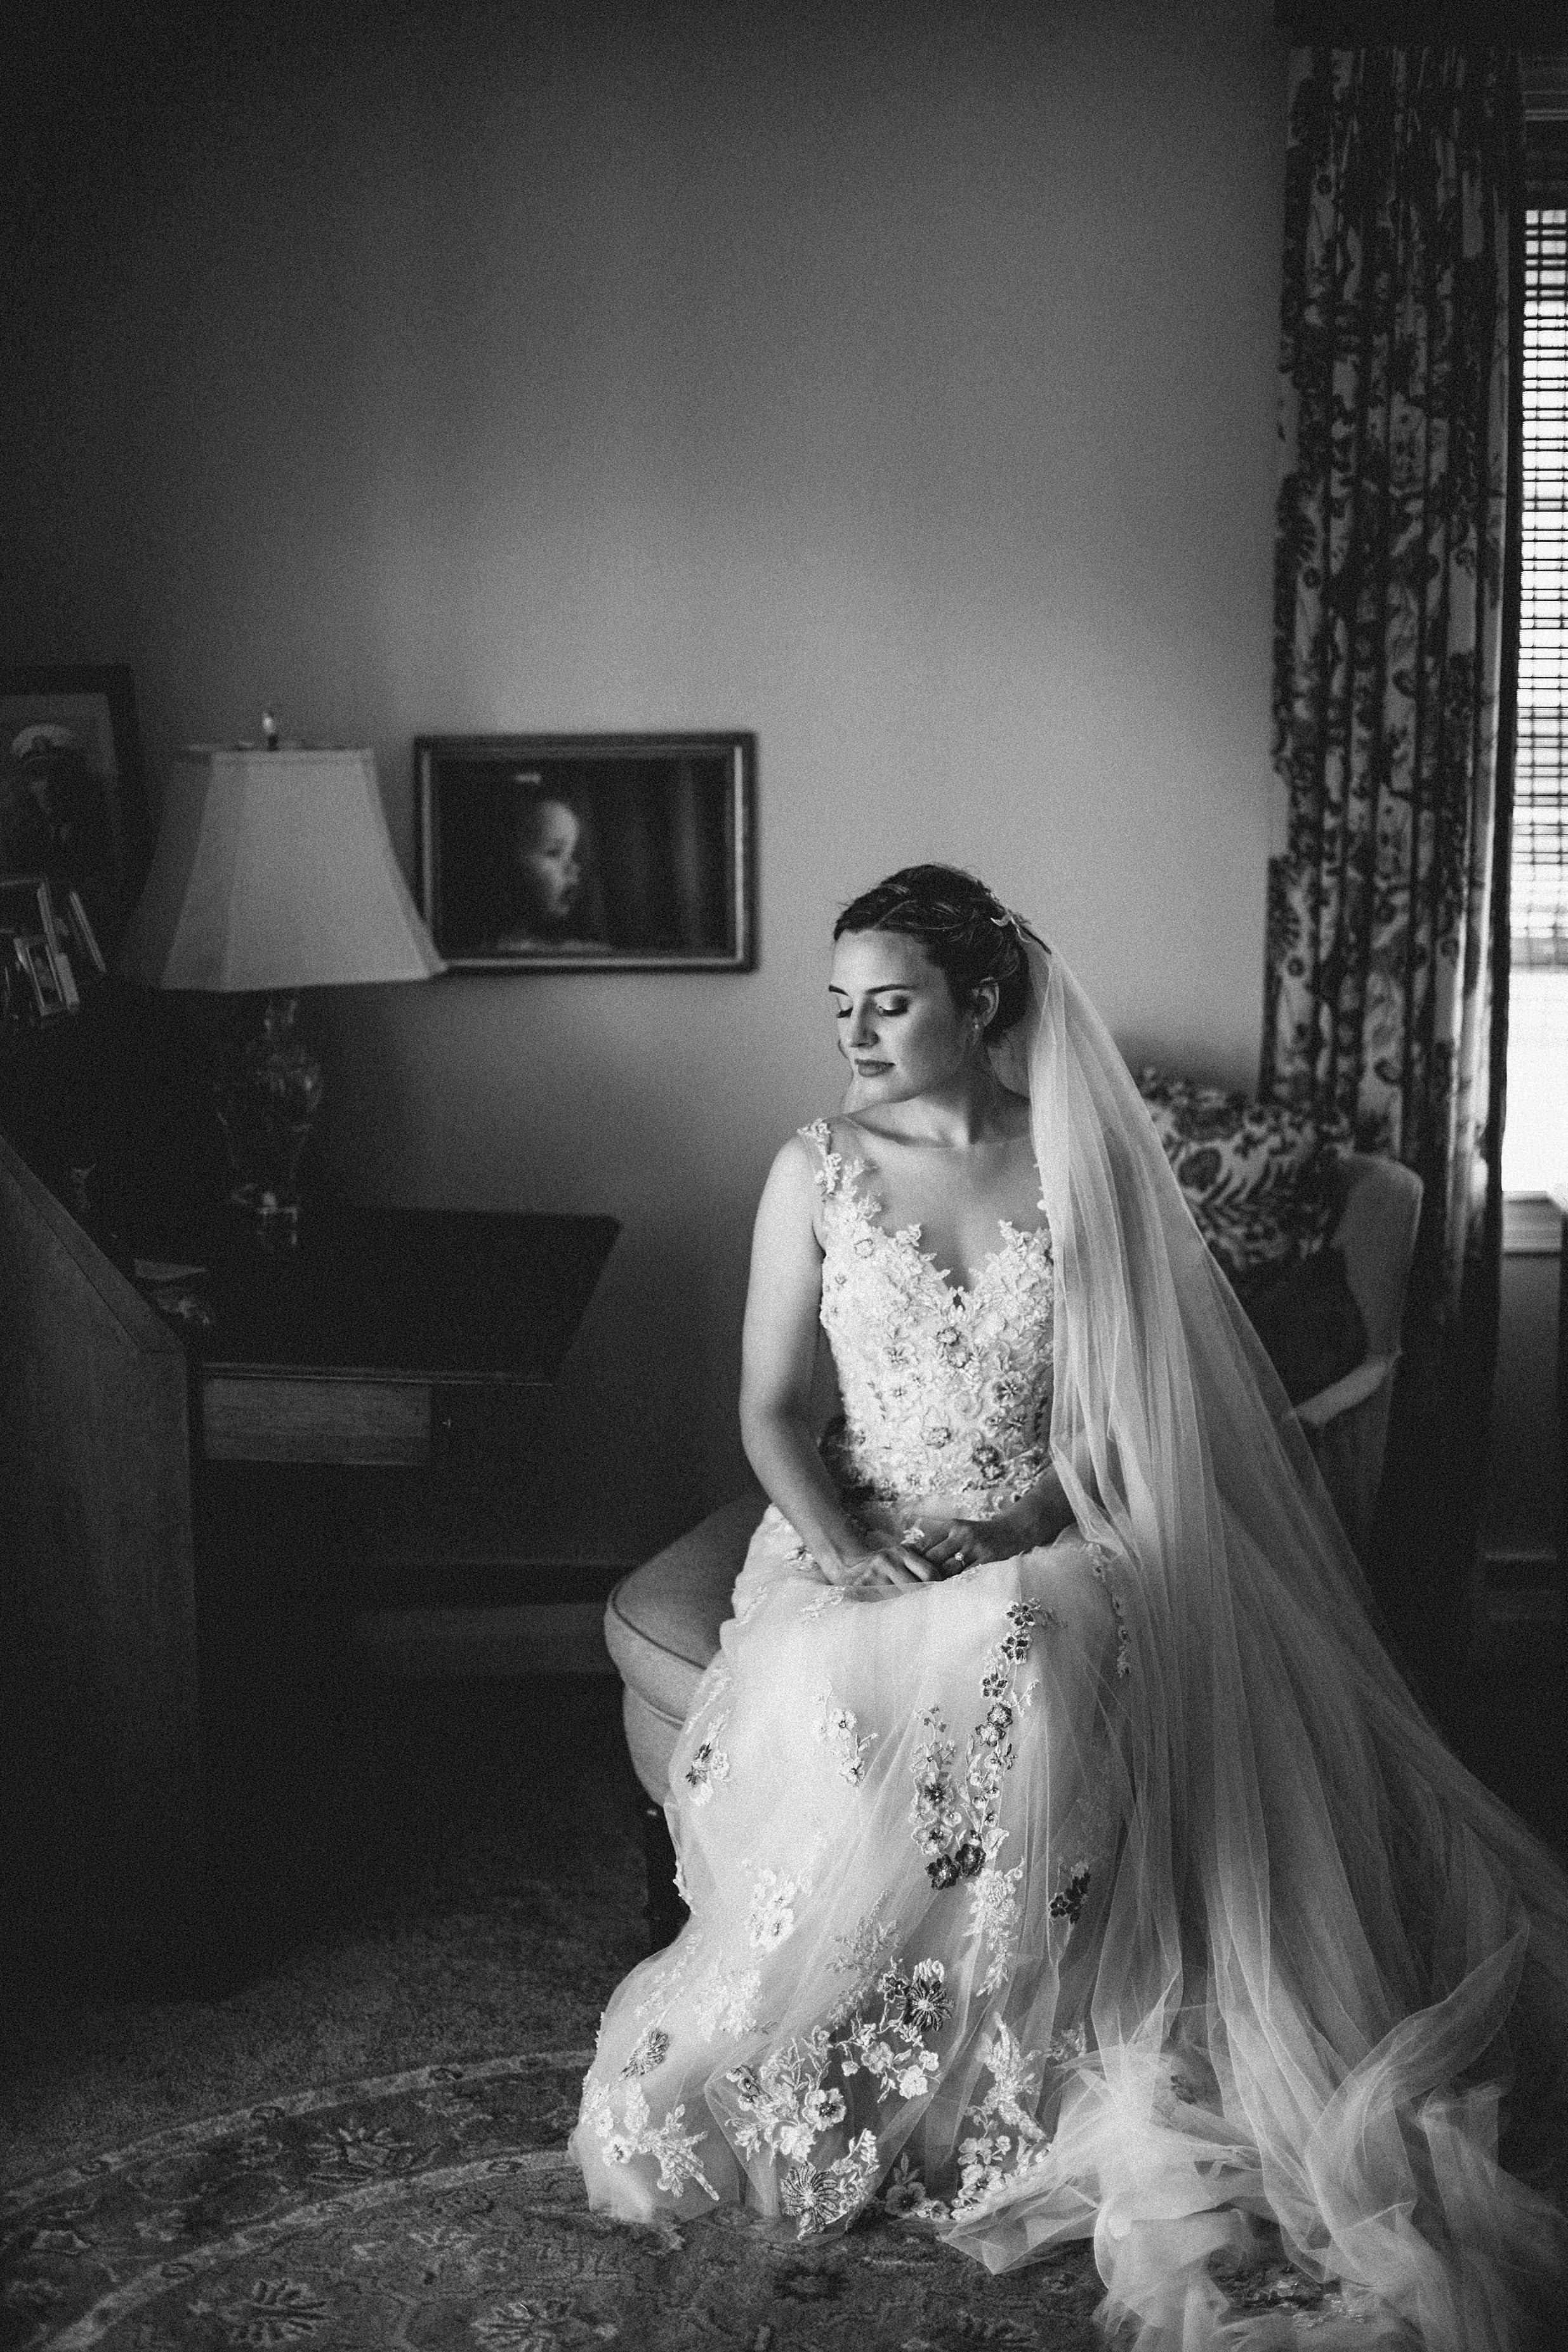 historic-upstate-ny-wedding-church-backyard-photographer_0011.jpg